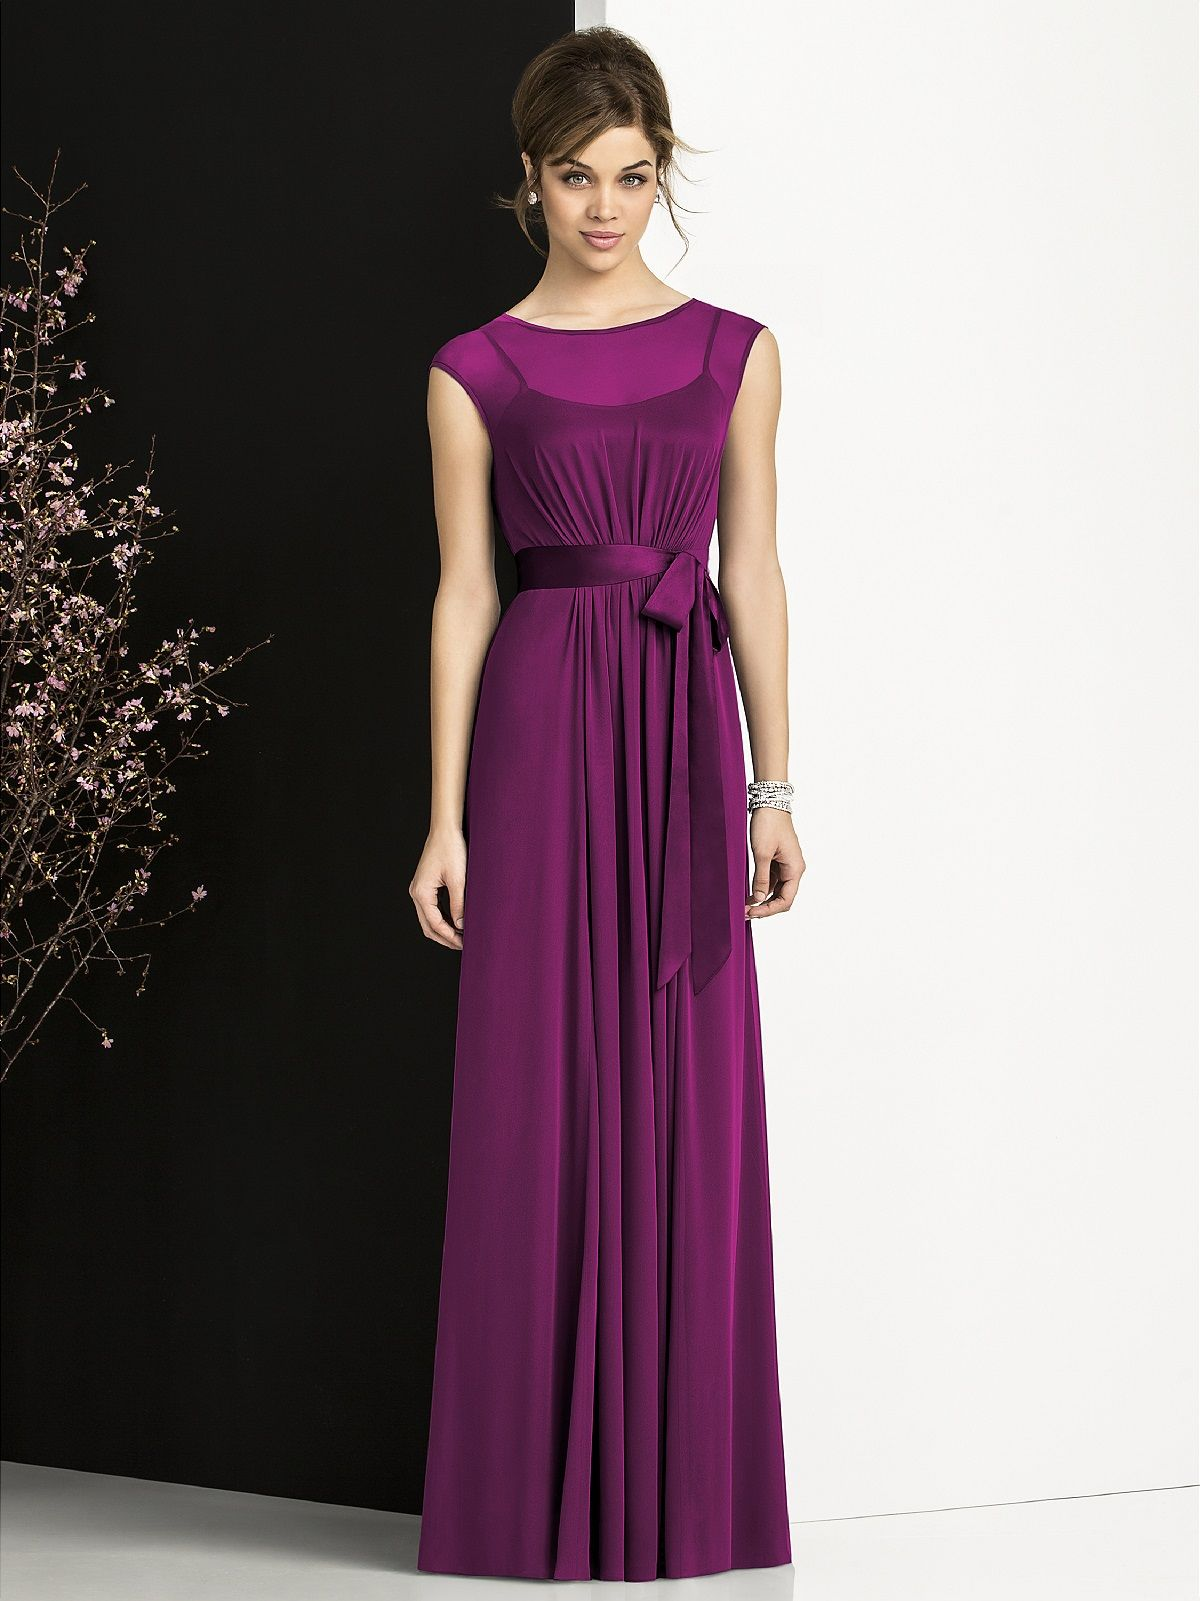 MICHAL After Six = Wild Berry | dream wedding dresses | Pinterest ...